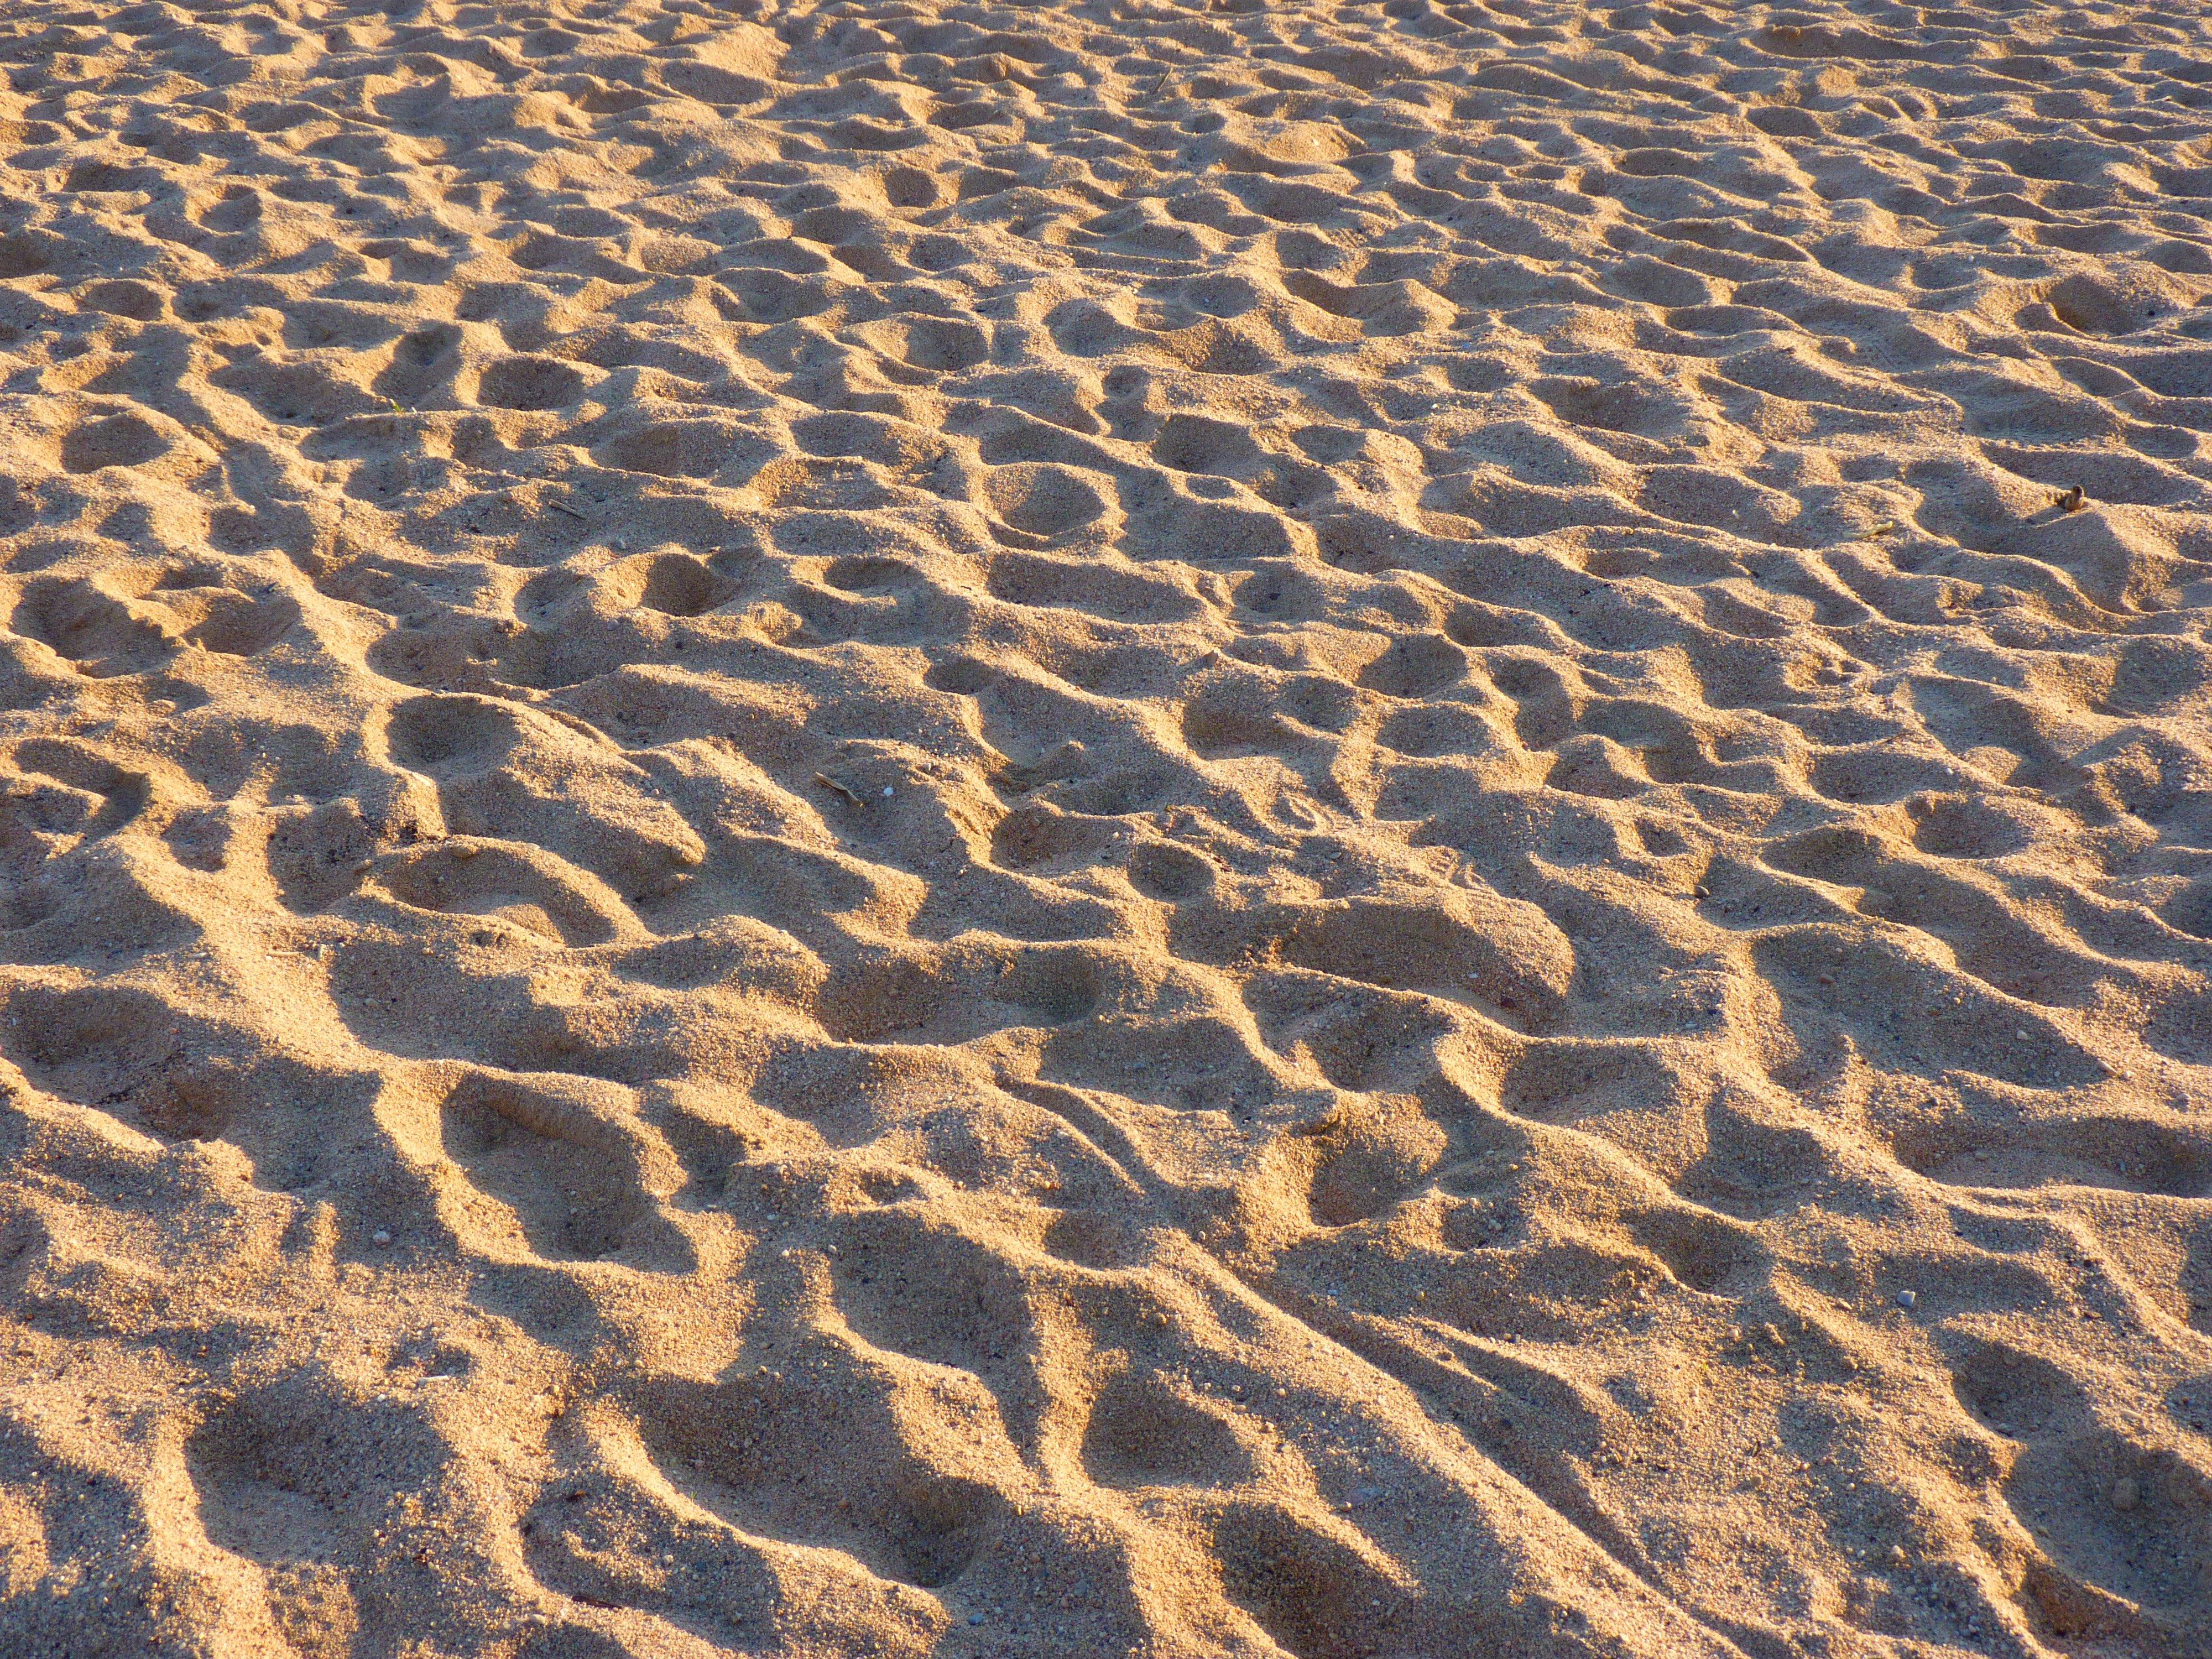 Картинки в песке